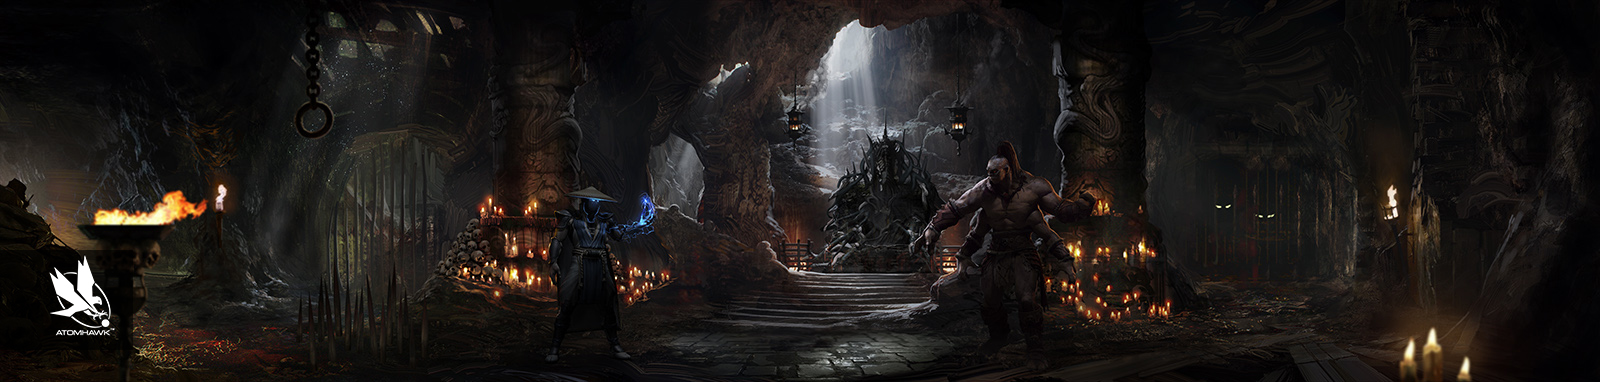 Atomhawk_Warner-Bros-NetherRealm_Mortal-Kombat-11_Concept-Art_Environment-Design_Goro's-Lair.jpg